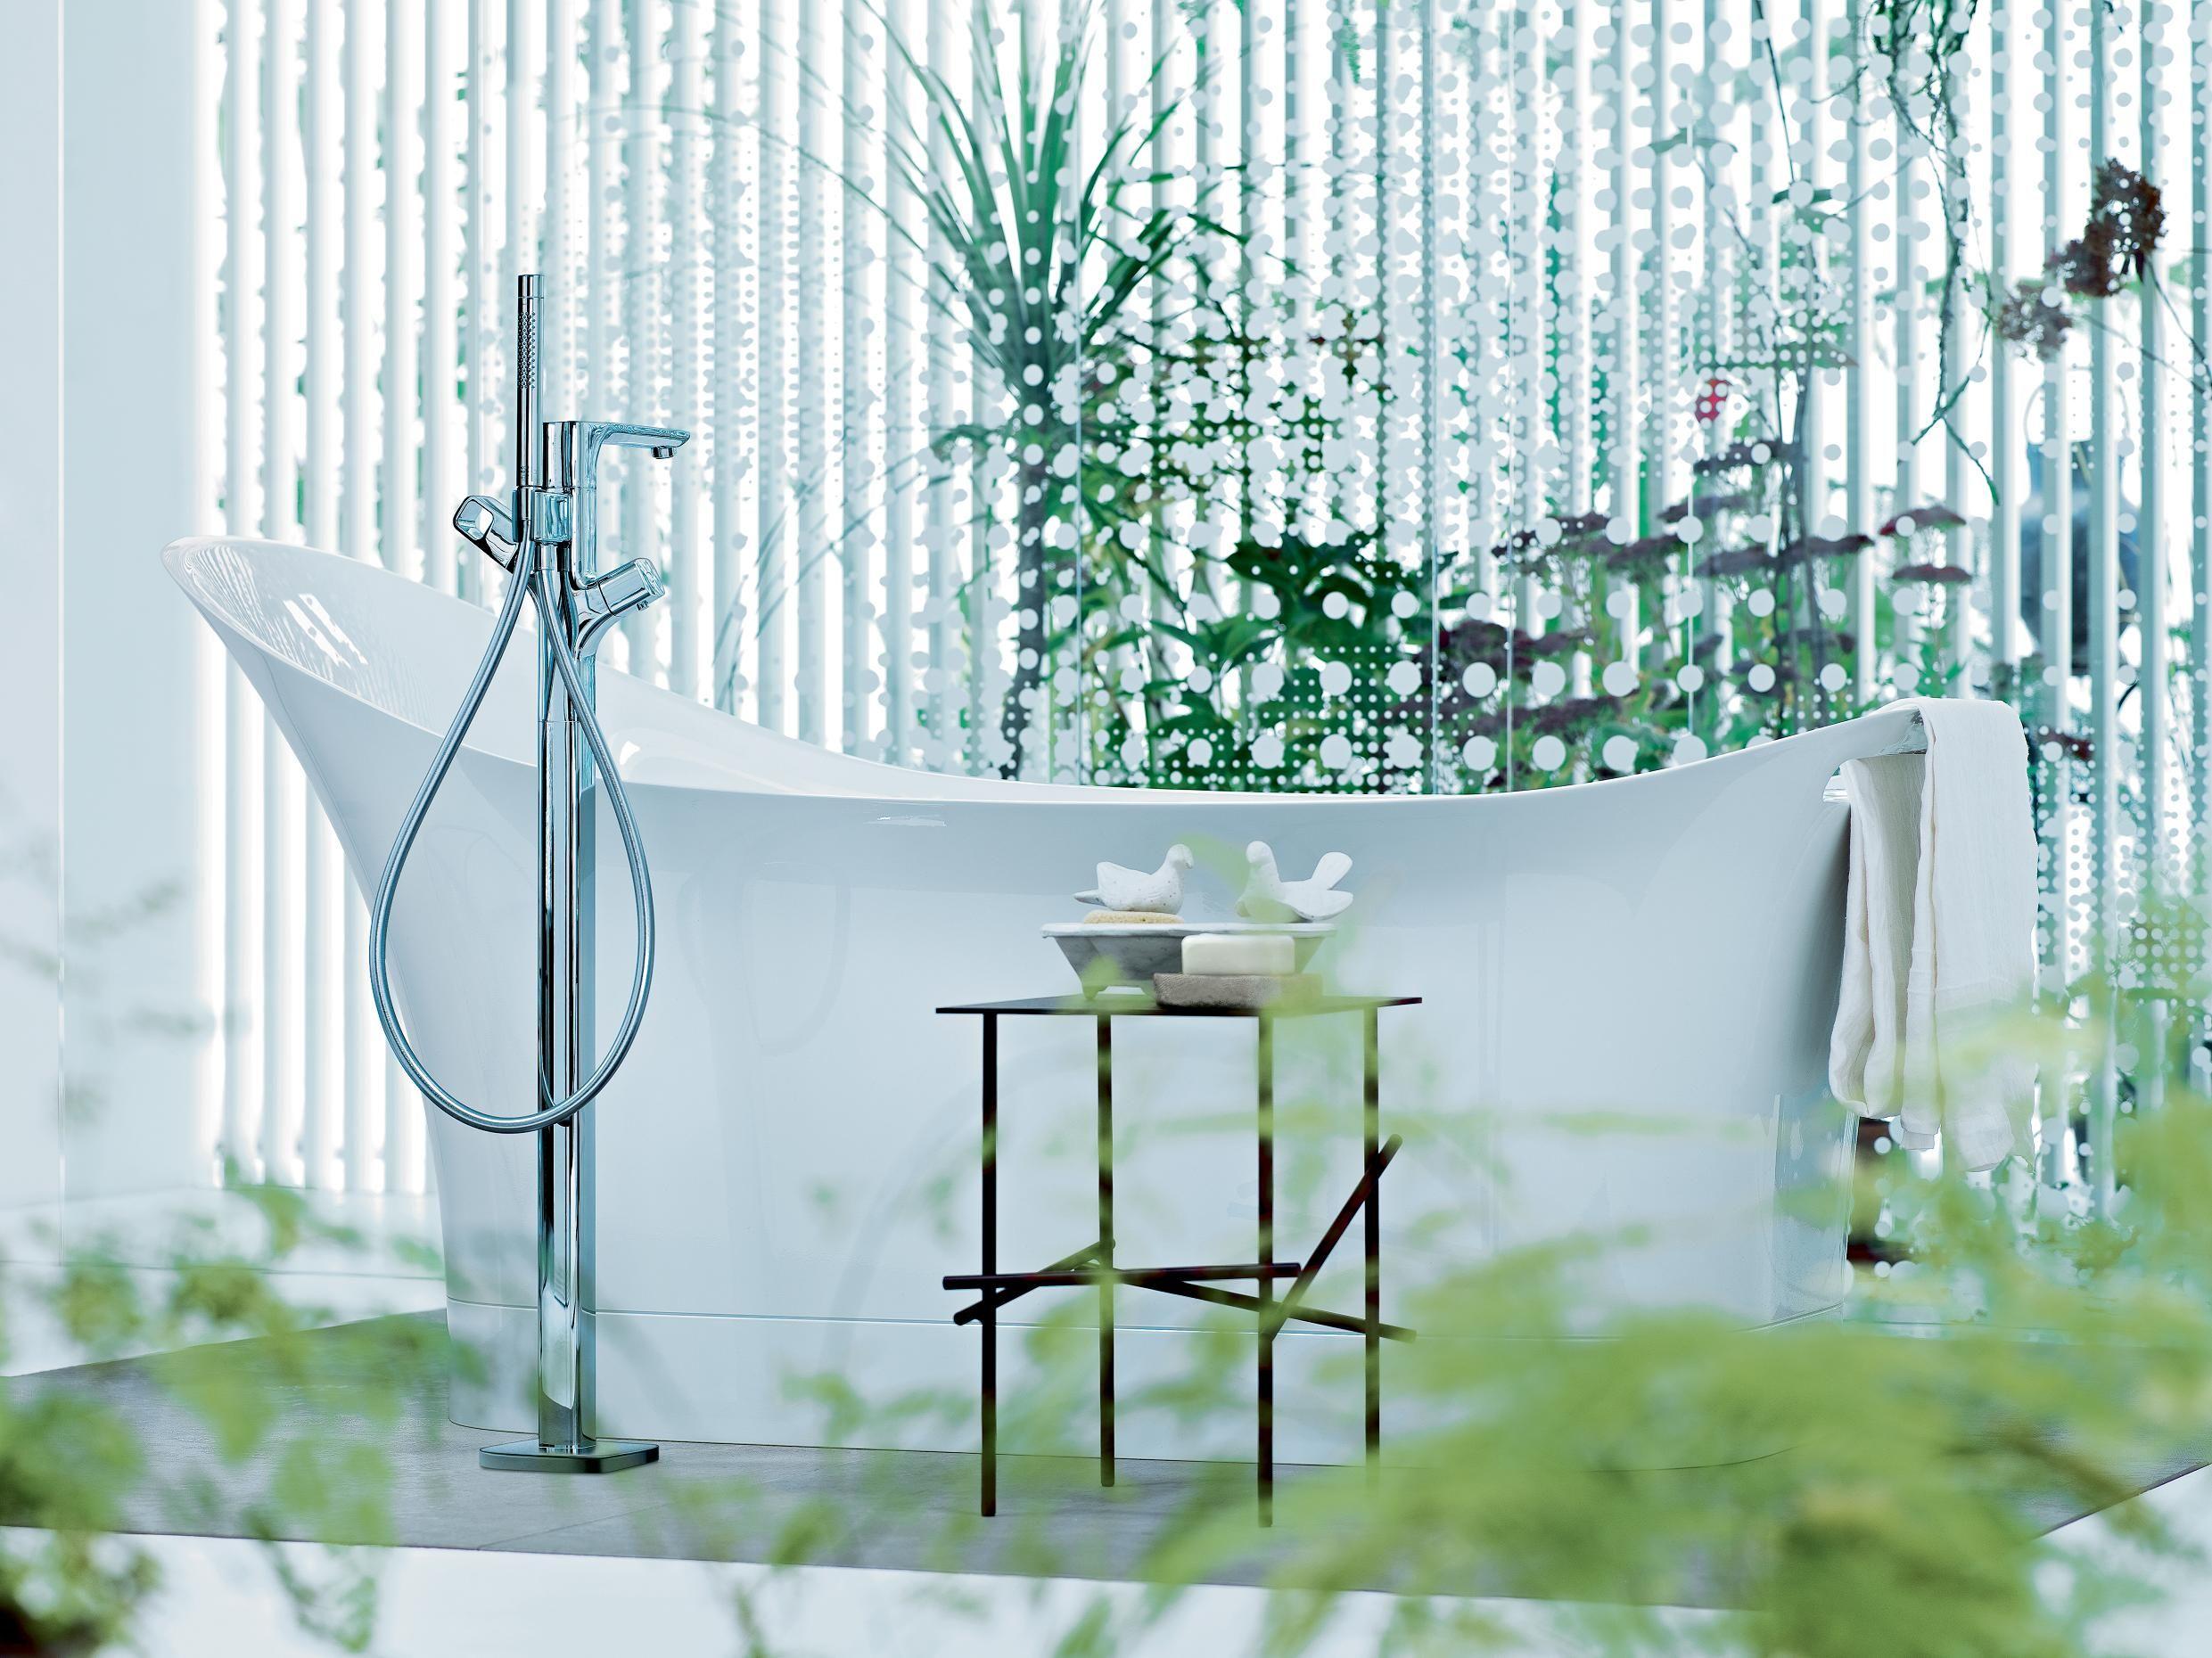 Badkamer Axor Urquiola : Axor urquiola bath and freestanding bath mixer luxurybathroom